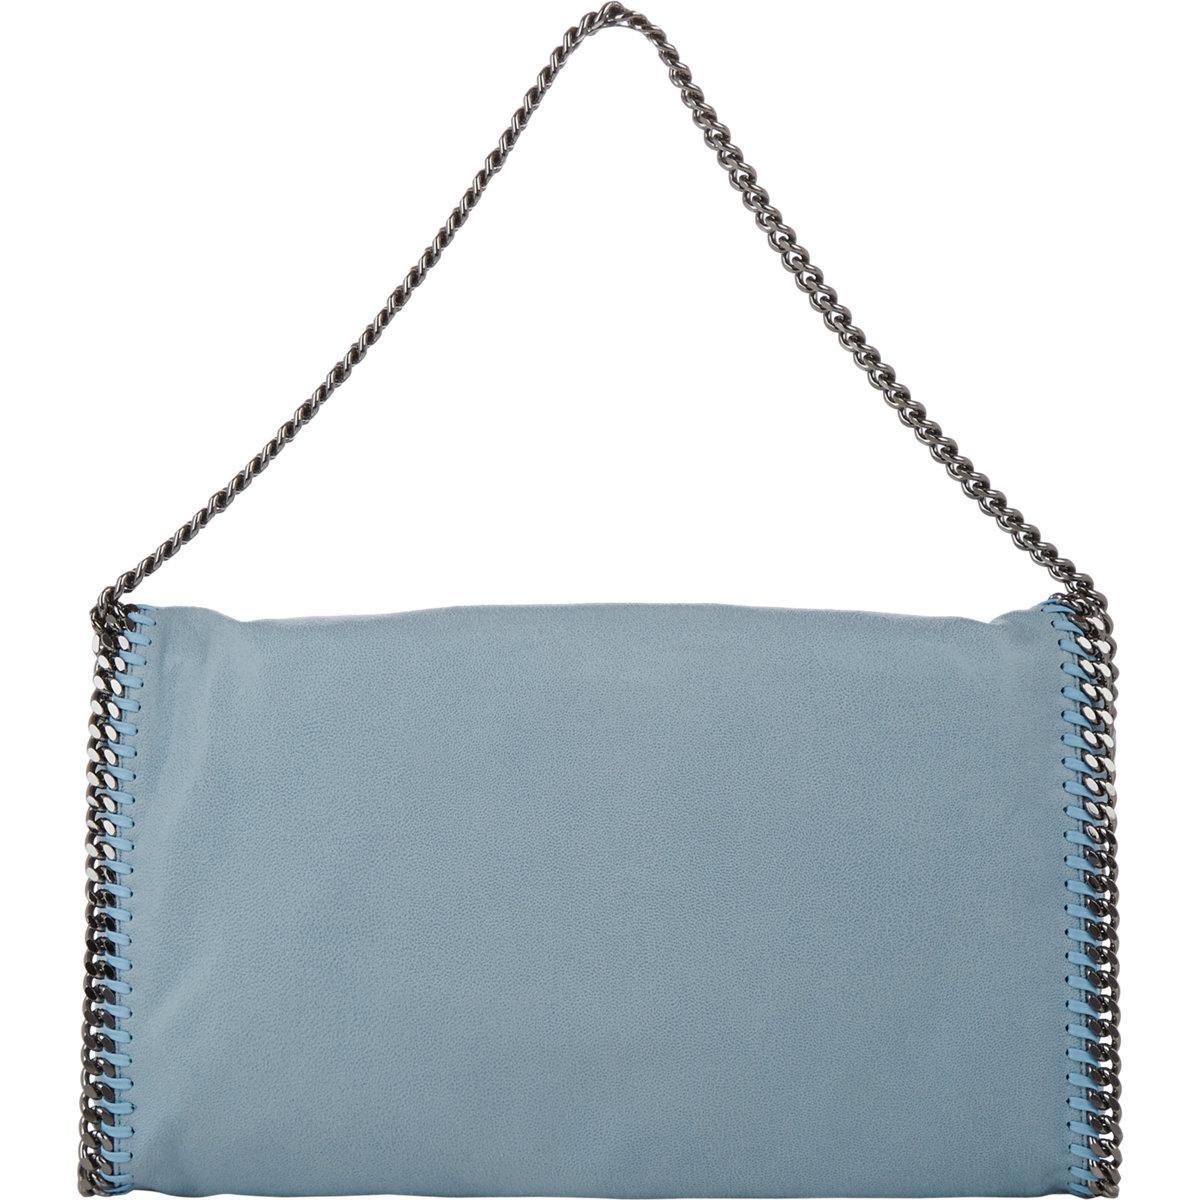 stella mccartney falabella shaggy deer foldover tote in blue lt blue lyst. Black Bedroom Furniture Sets. Home Design Ideas